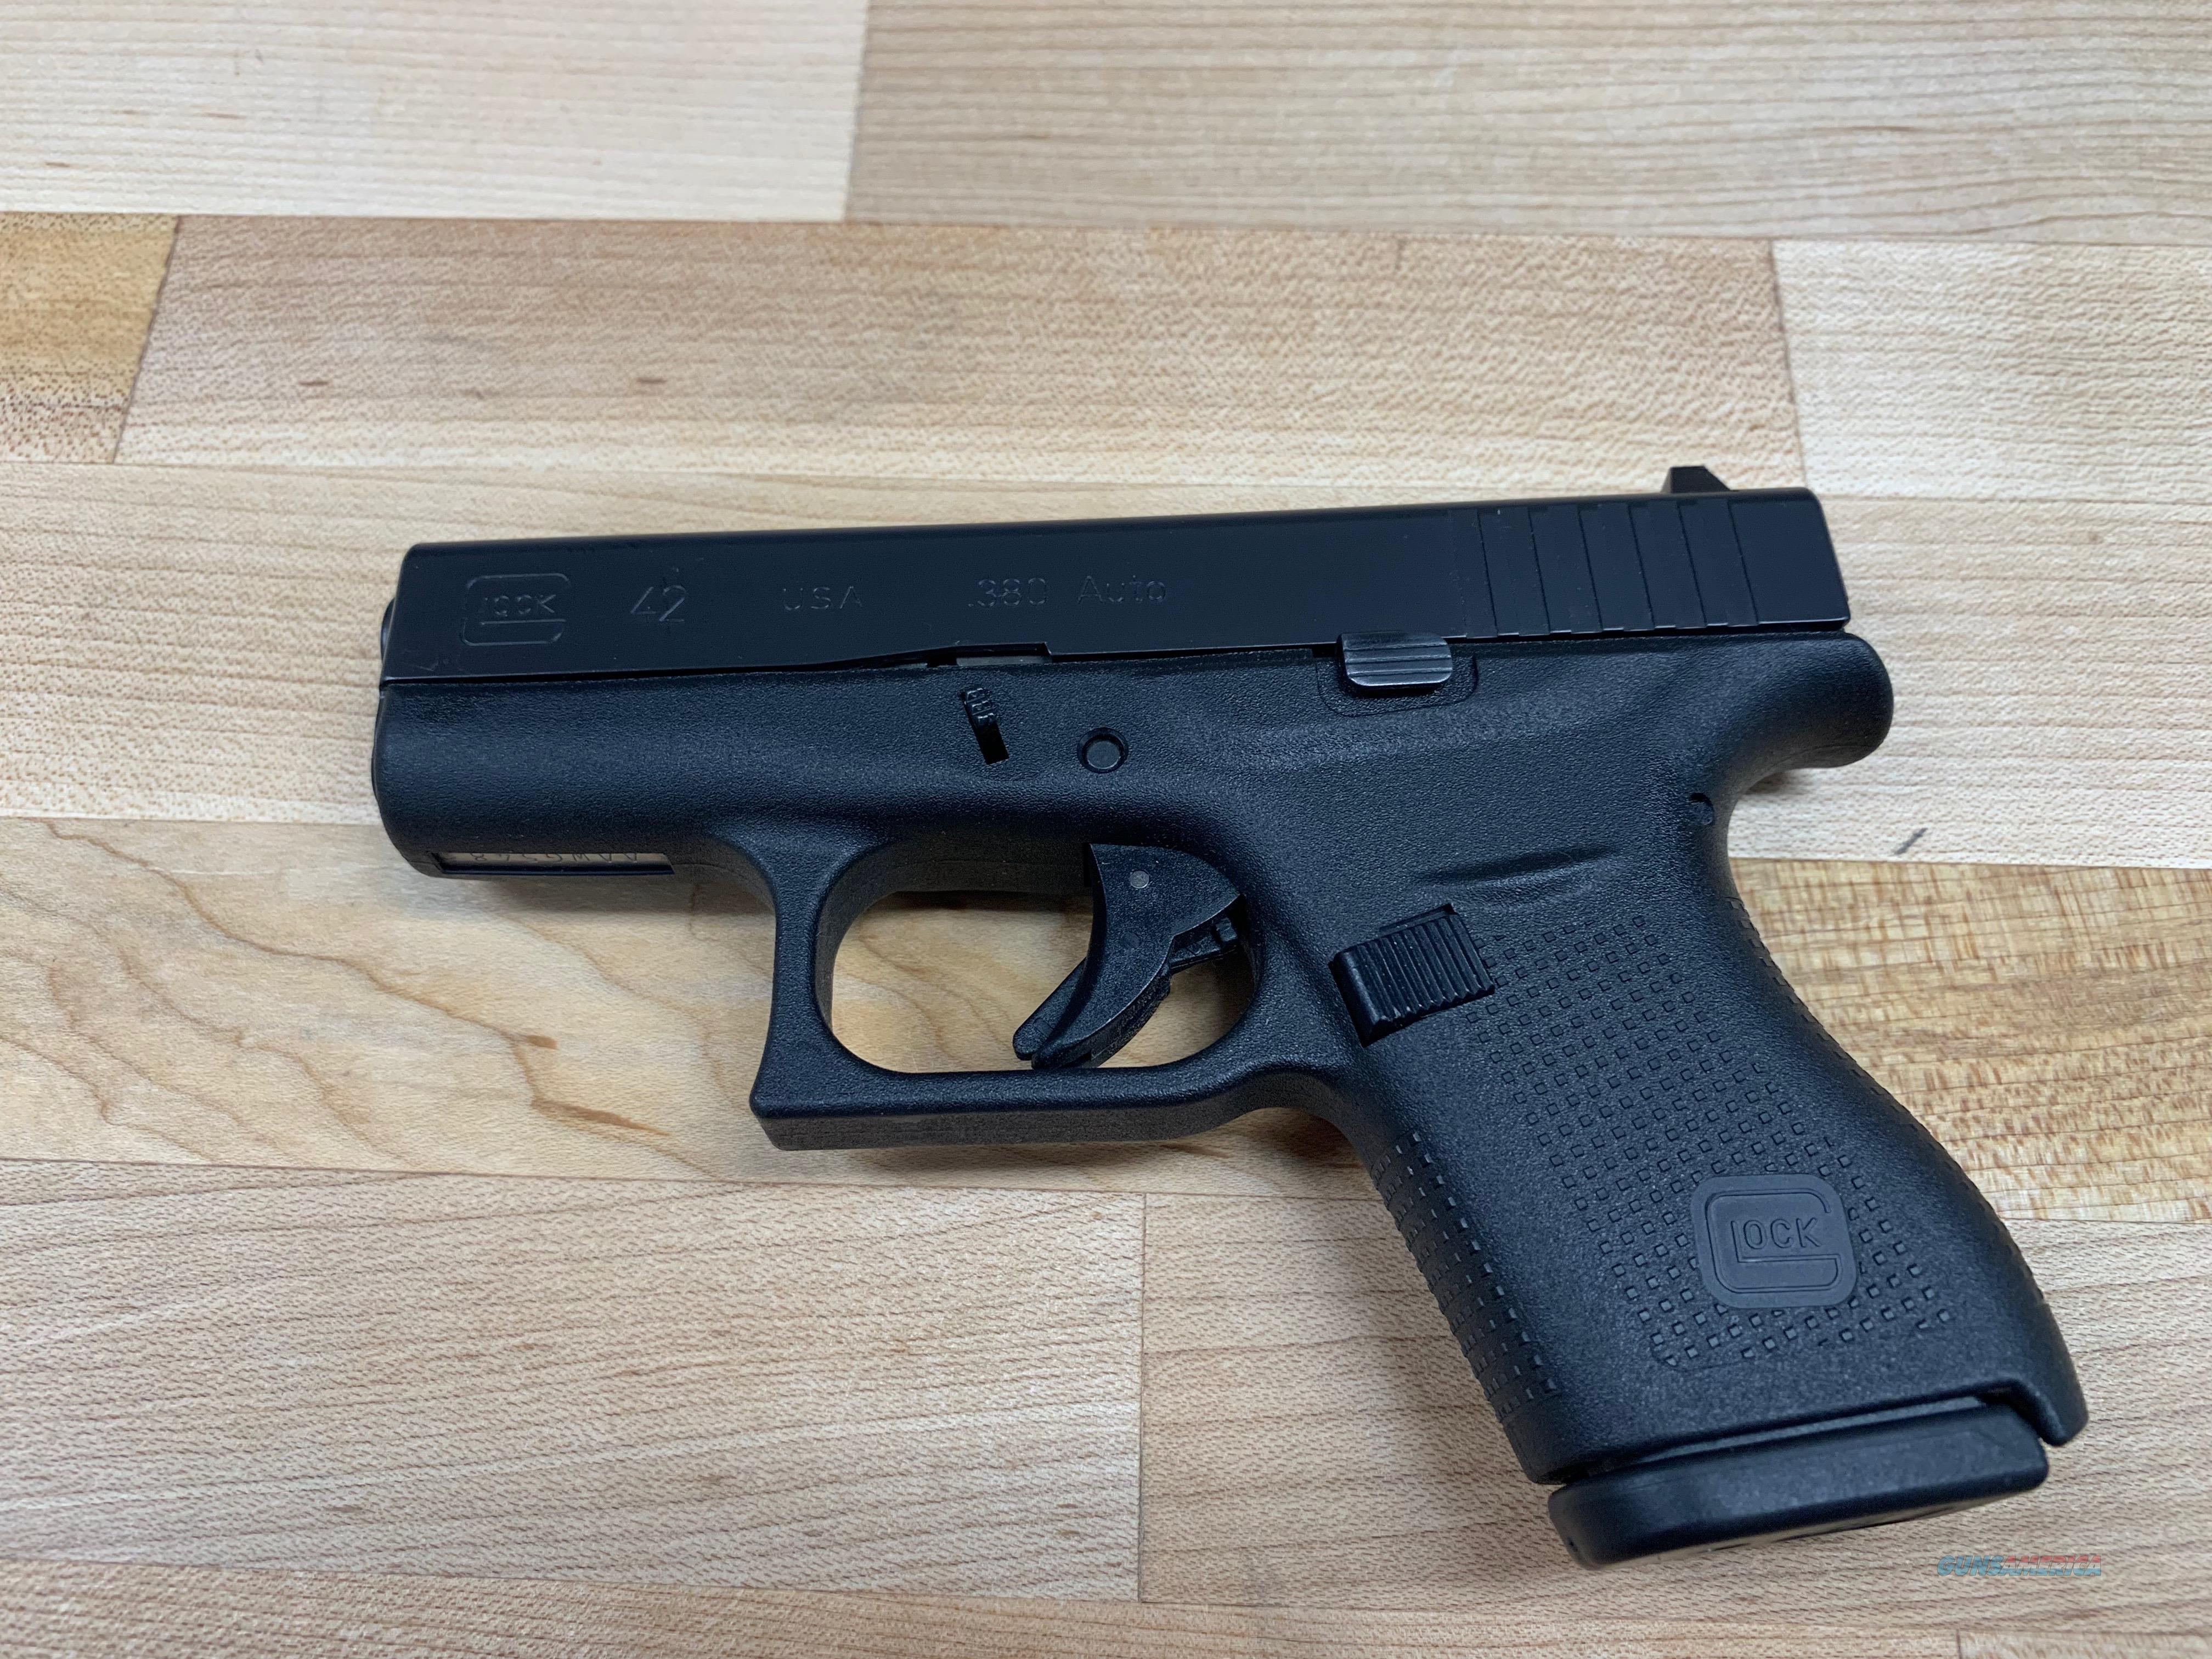 Glock UI4250201 G42 Subcompact Double 380   Guns > Pistols > Glock Pistols > 42